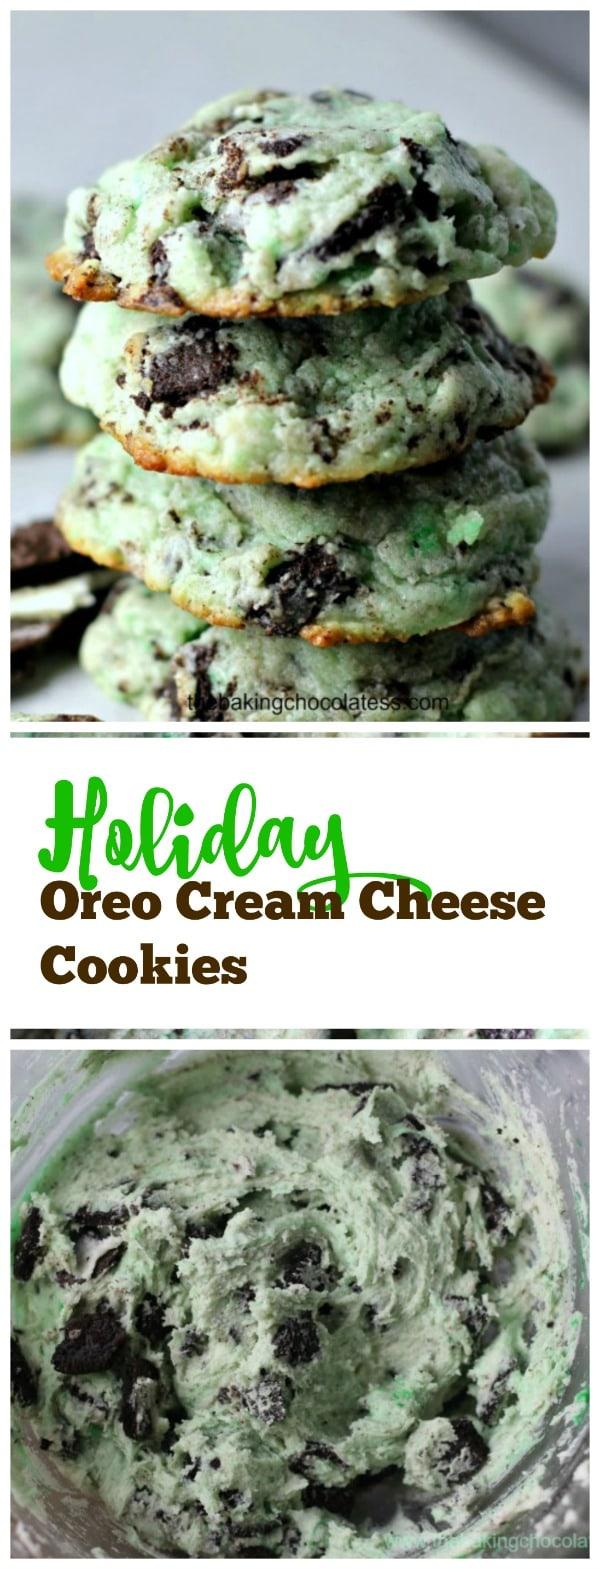 Holiday Oreo Cream Cheese Cookies #holiday #cookies #oreos #green #stpatricks #baking #christmas